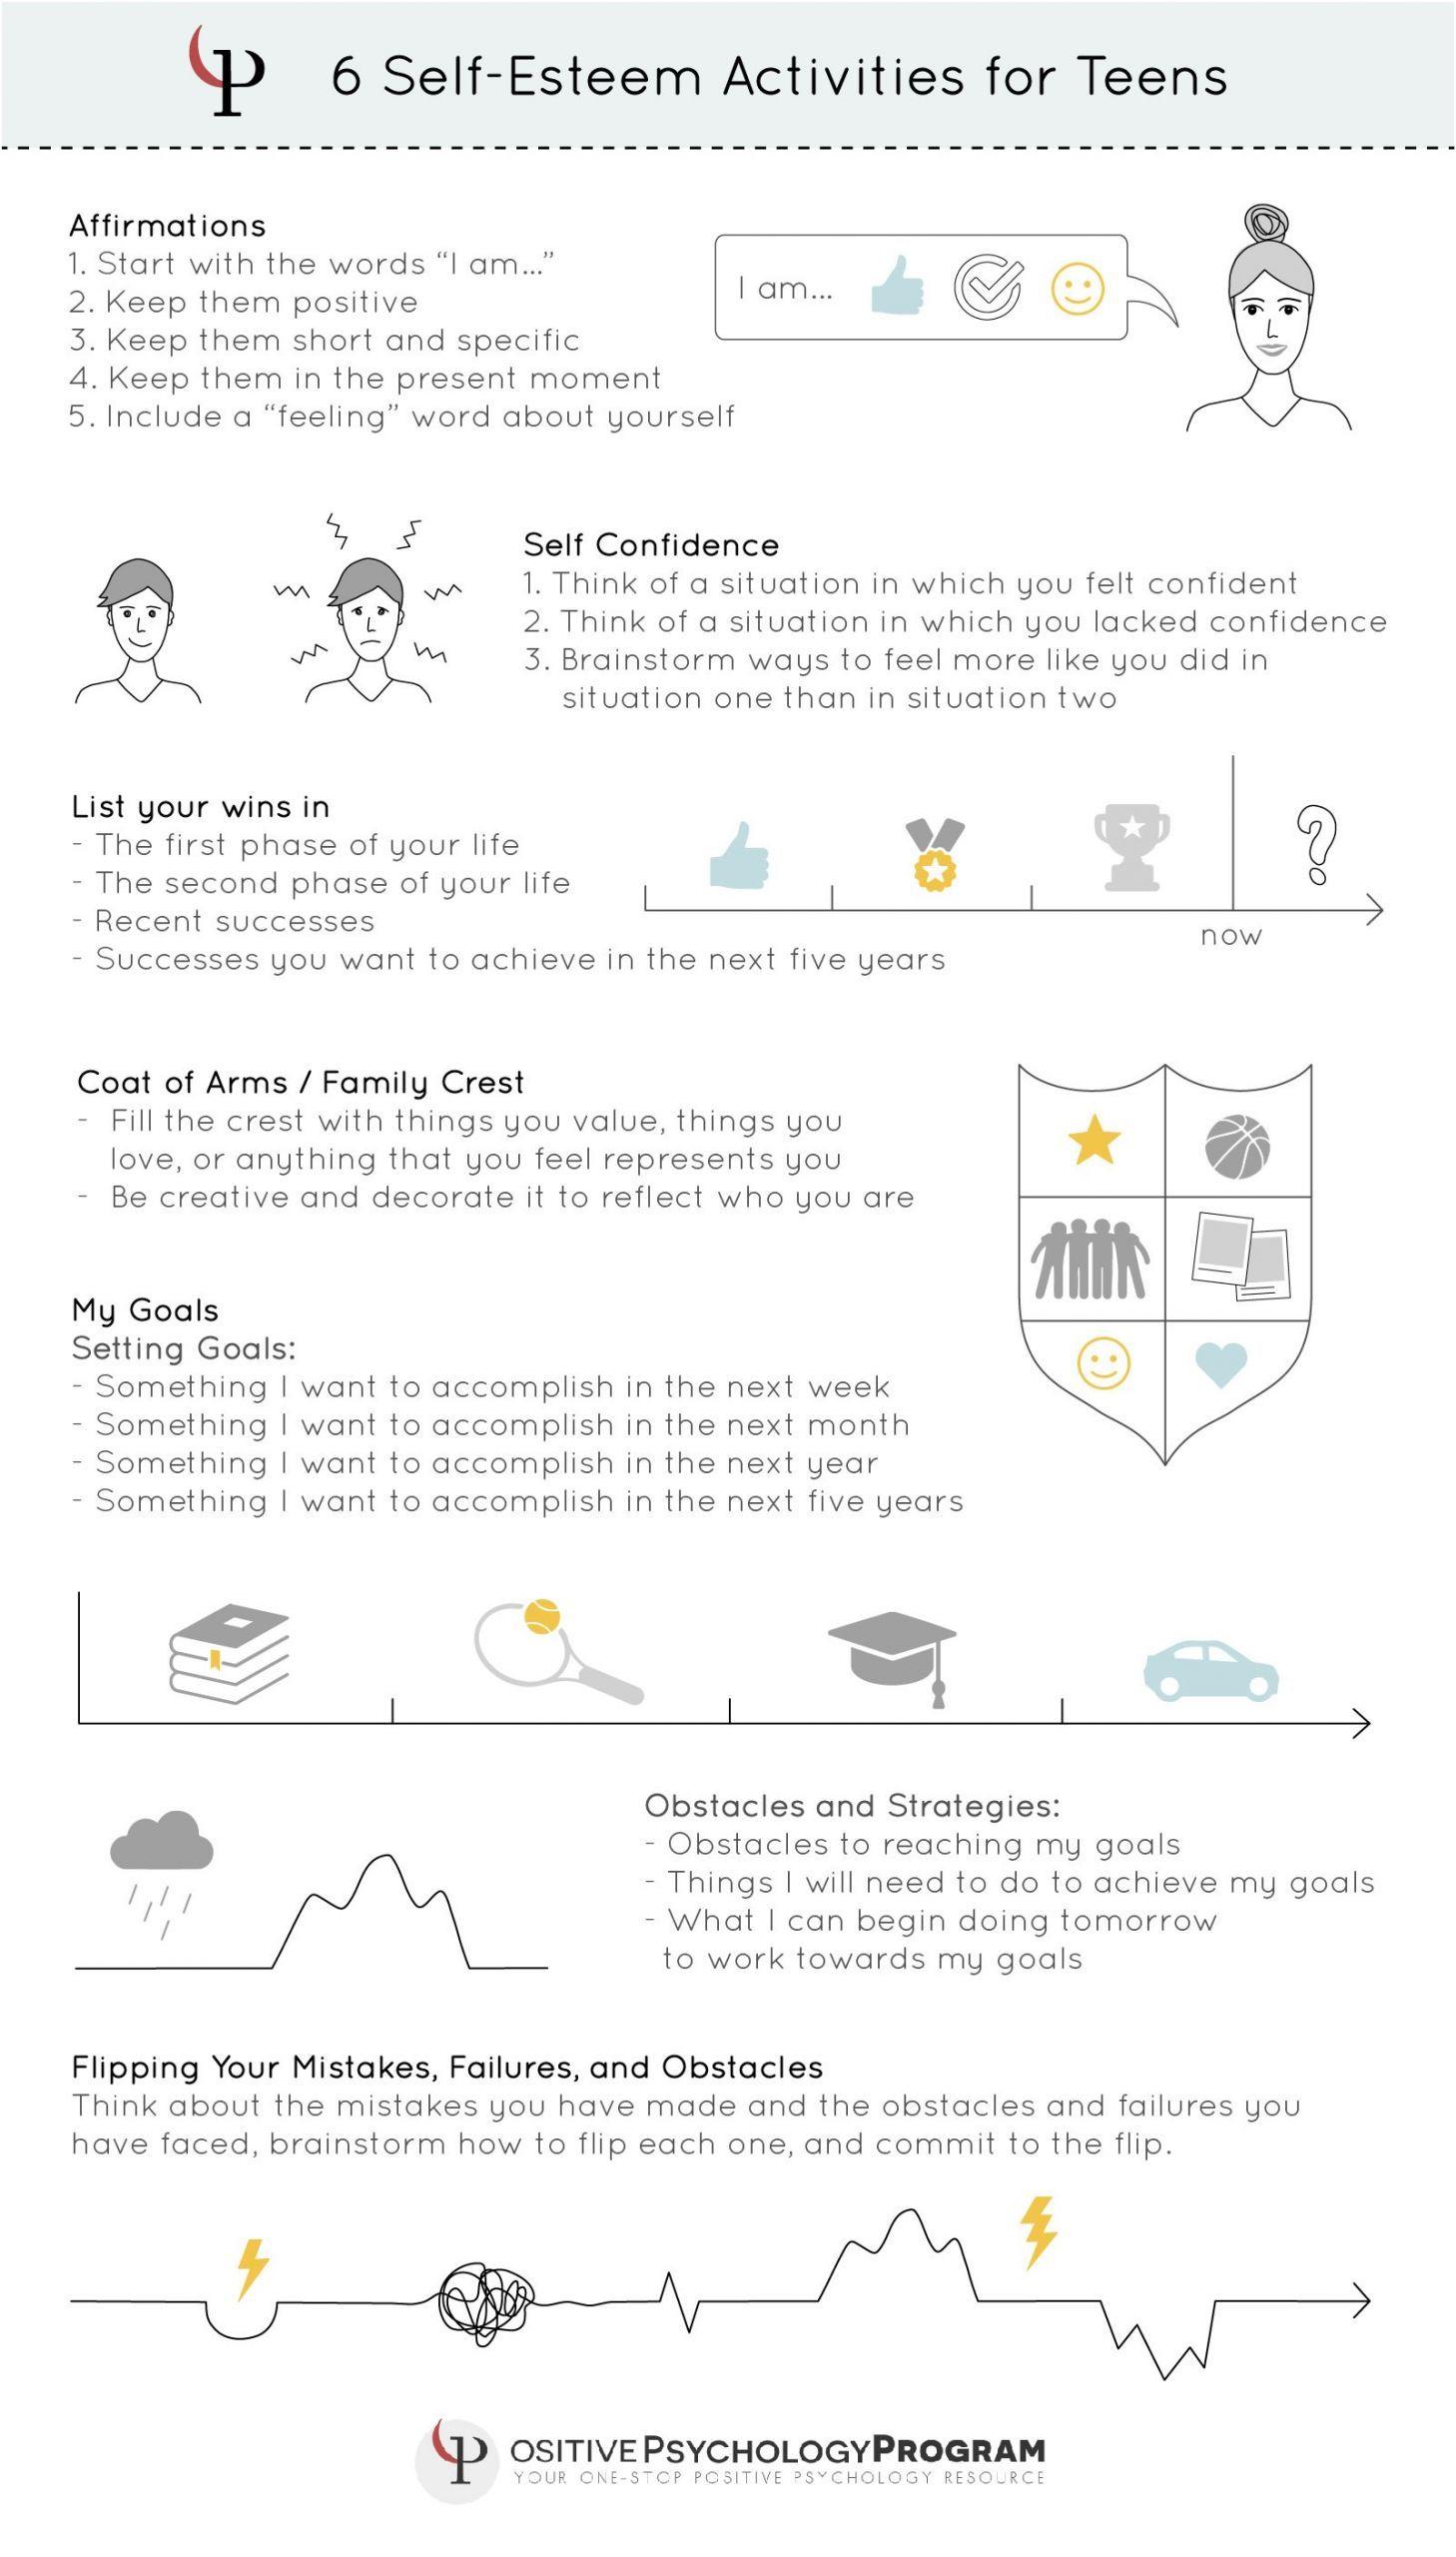 8 Classified Free Self Esteem Worksheets For Kids Self Esteem Activities Activities For Teens Self Esteem Worksheets